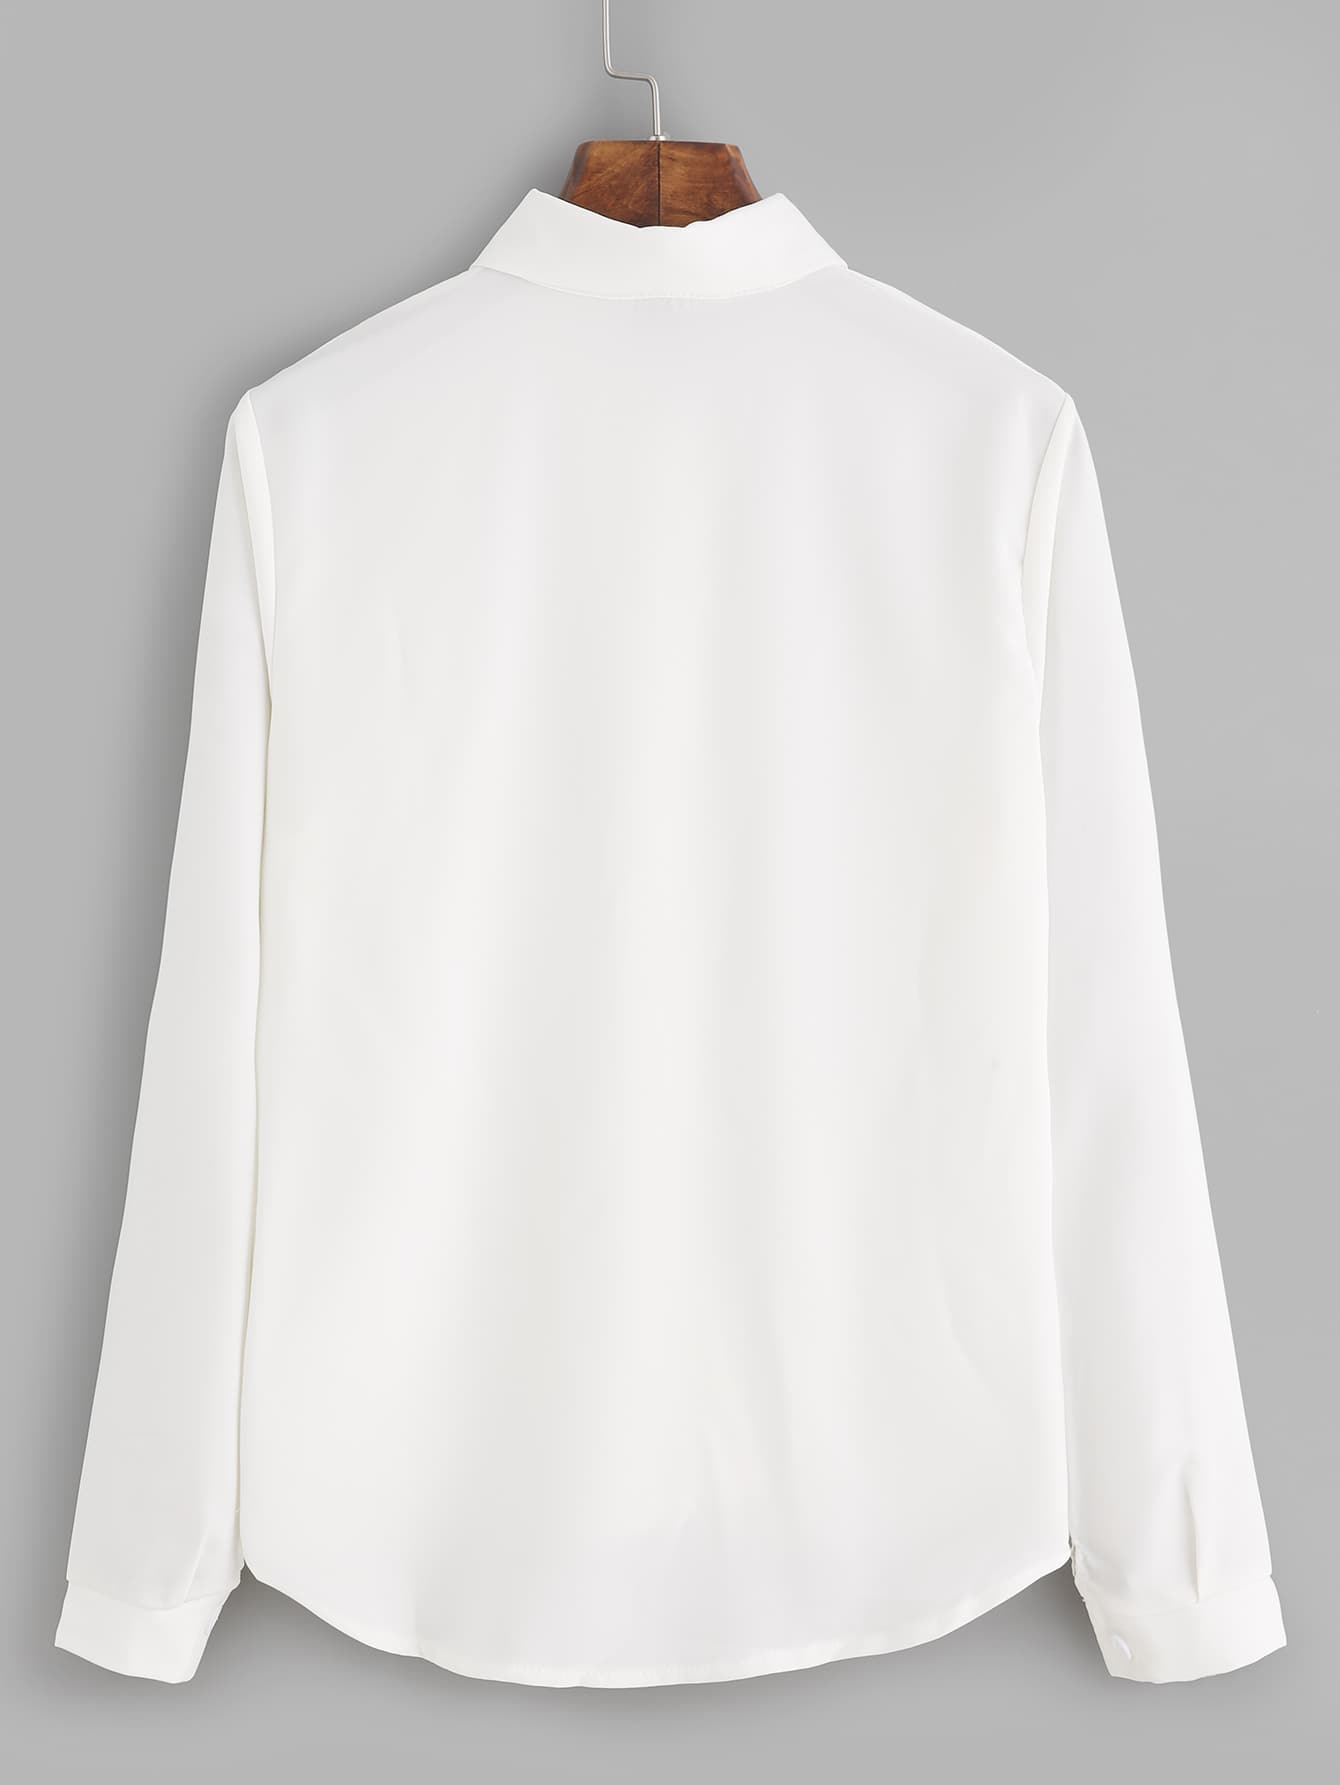 blouse160822008_2